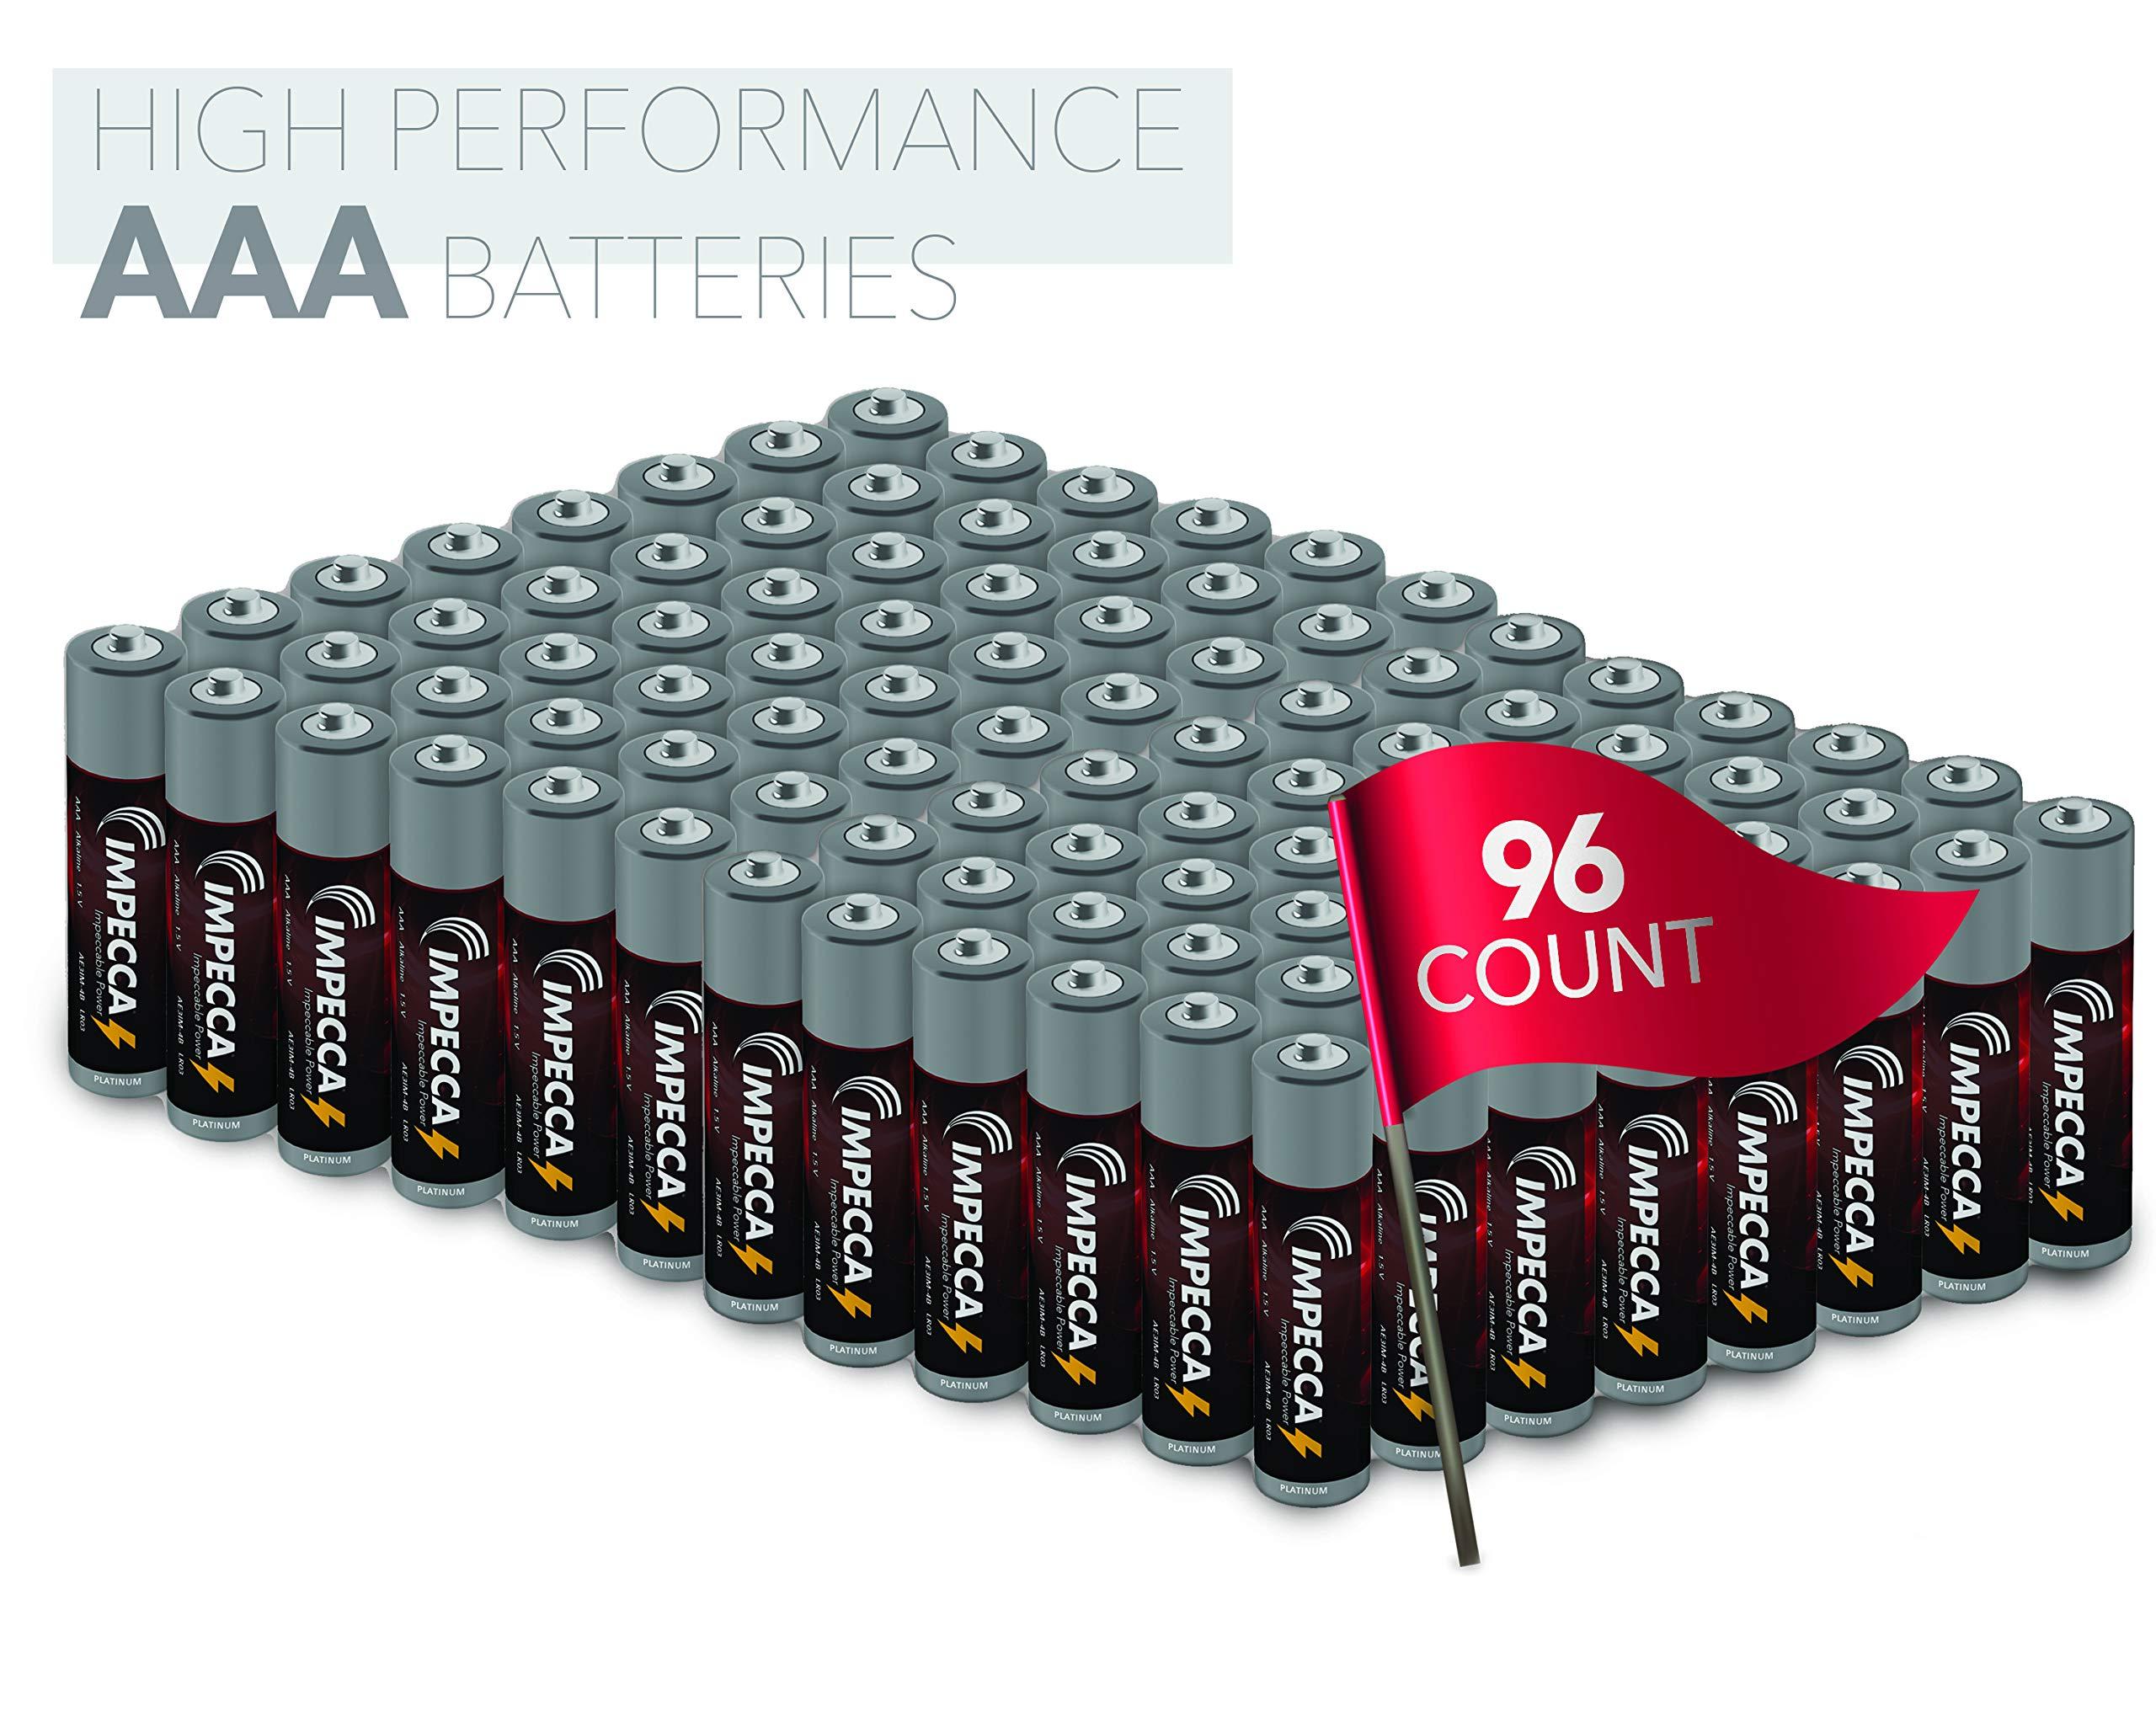 Impecca AAA Alkaline Batteries, High Performance AAA Battery, 10 Year Long Lasting Shelf Life, 96 Pack, LR3, Platinum